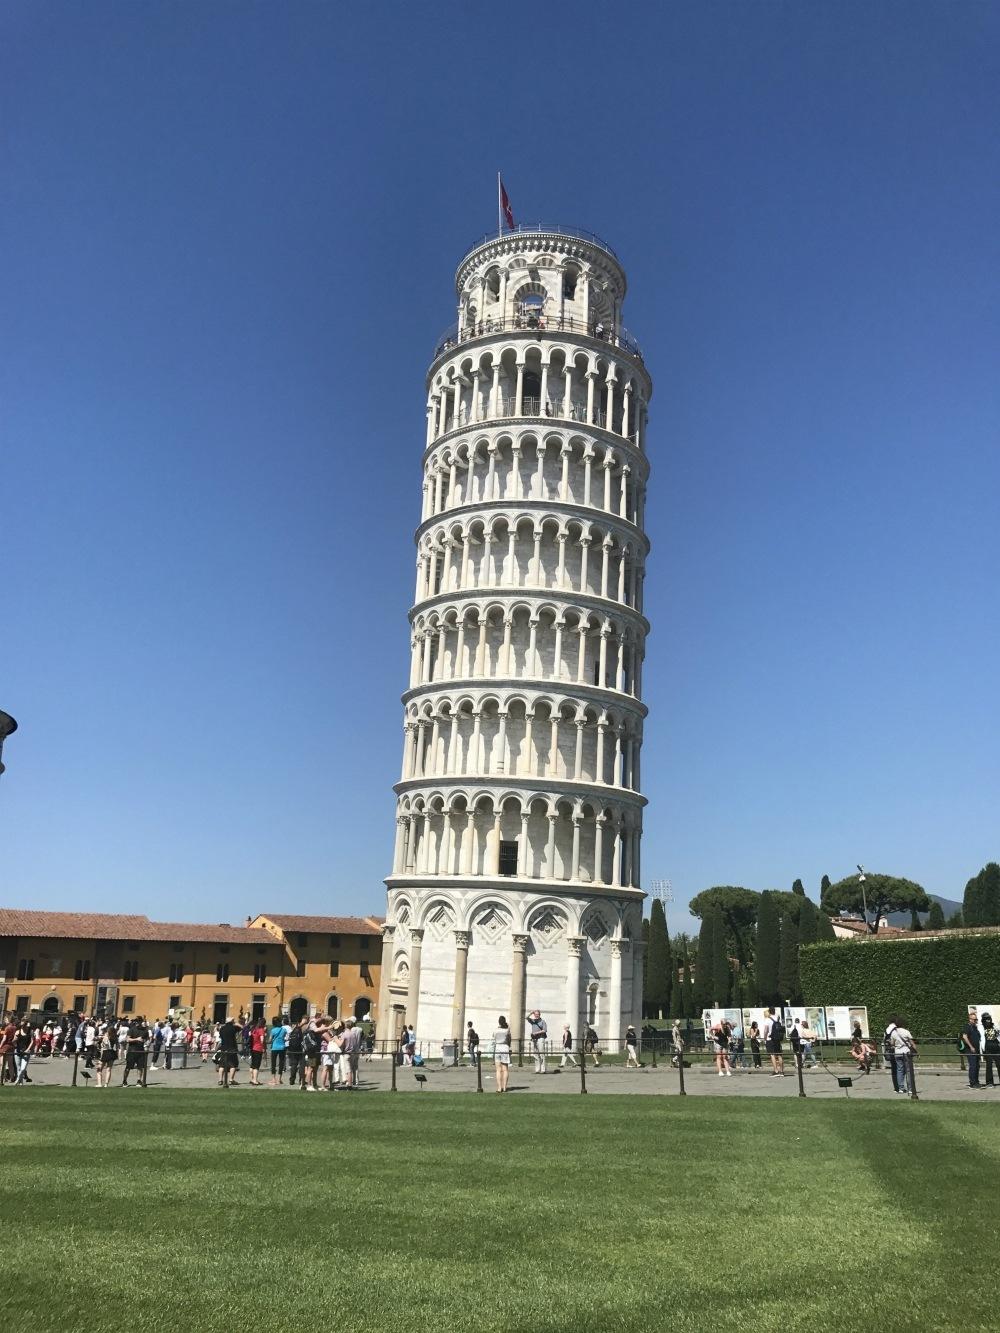 Leaning tower of Pisa Photo Heatheronhertravels.com